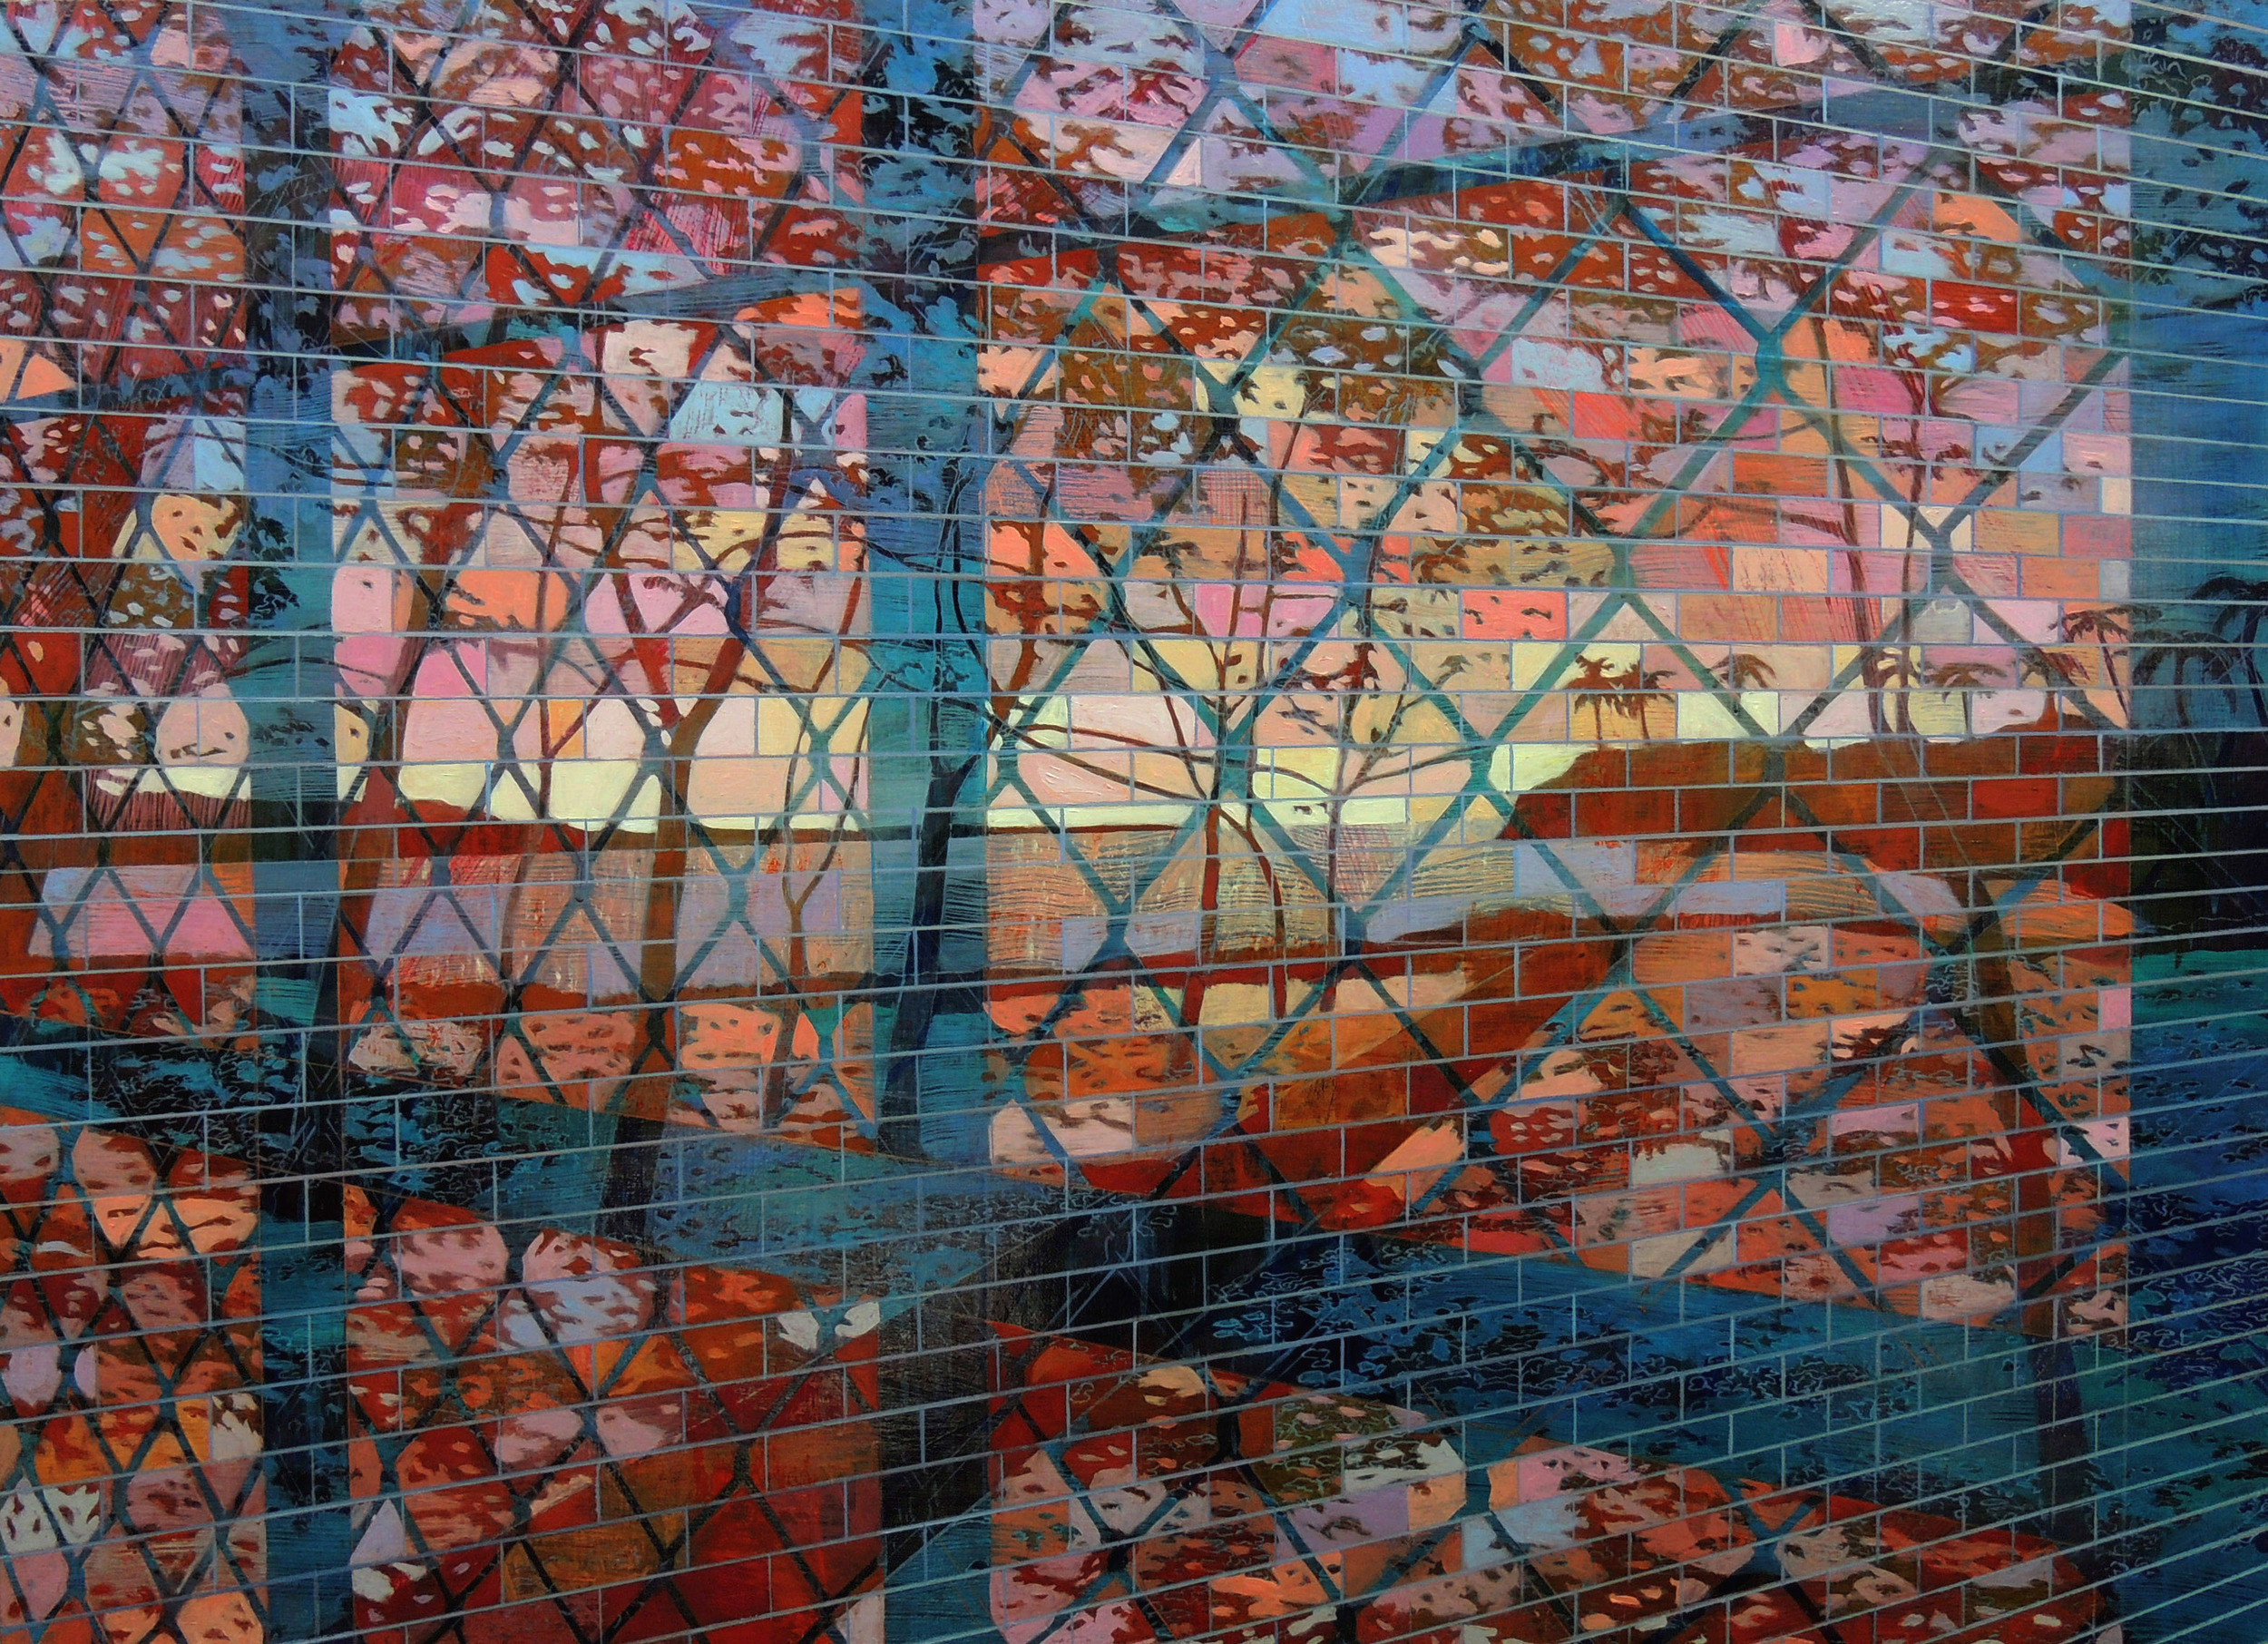 Isla Vista Beach   18 x 24  Oil On Canvas  2014